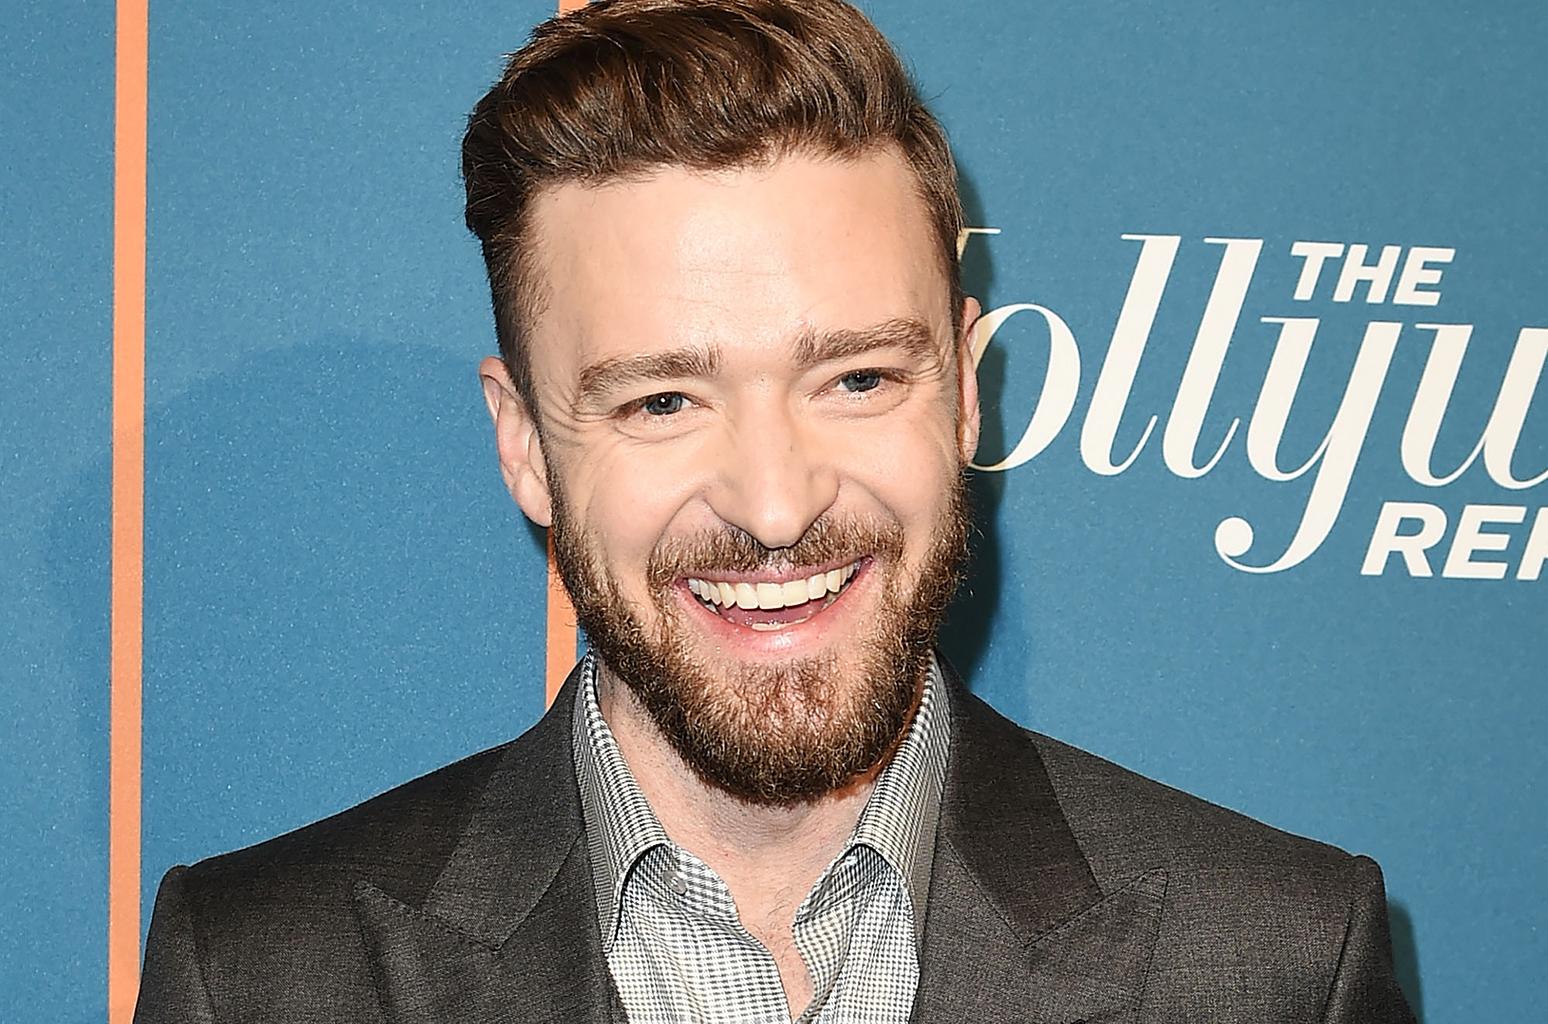 Justin Timberlake(ジャスティン・ティンバーレイク)のプロフィール・バイオグラフィーまとめ